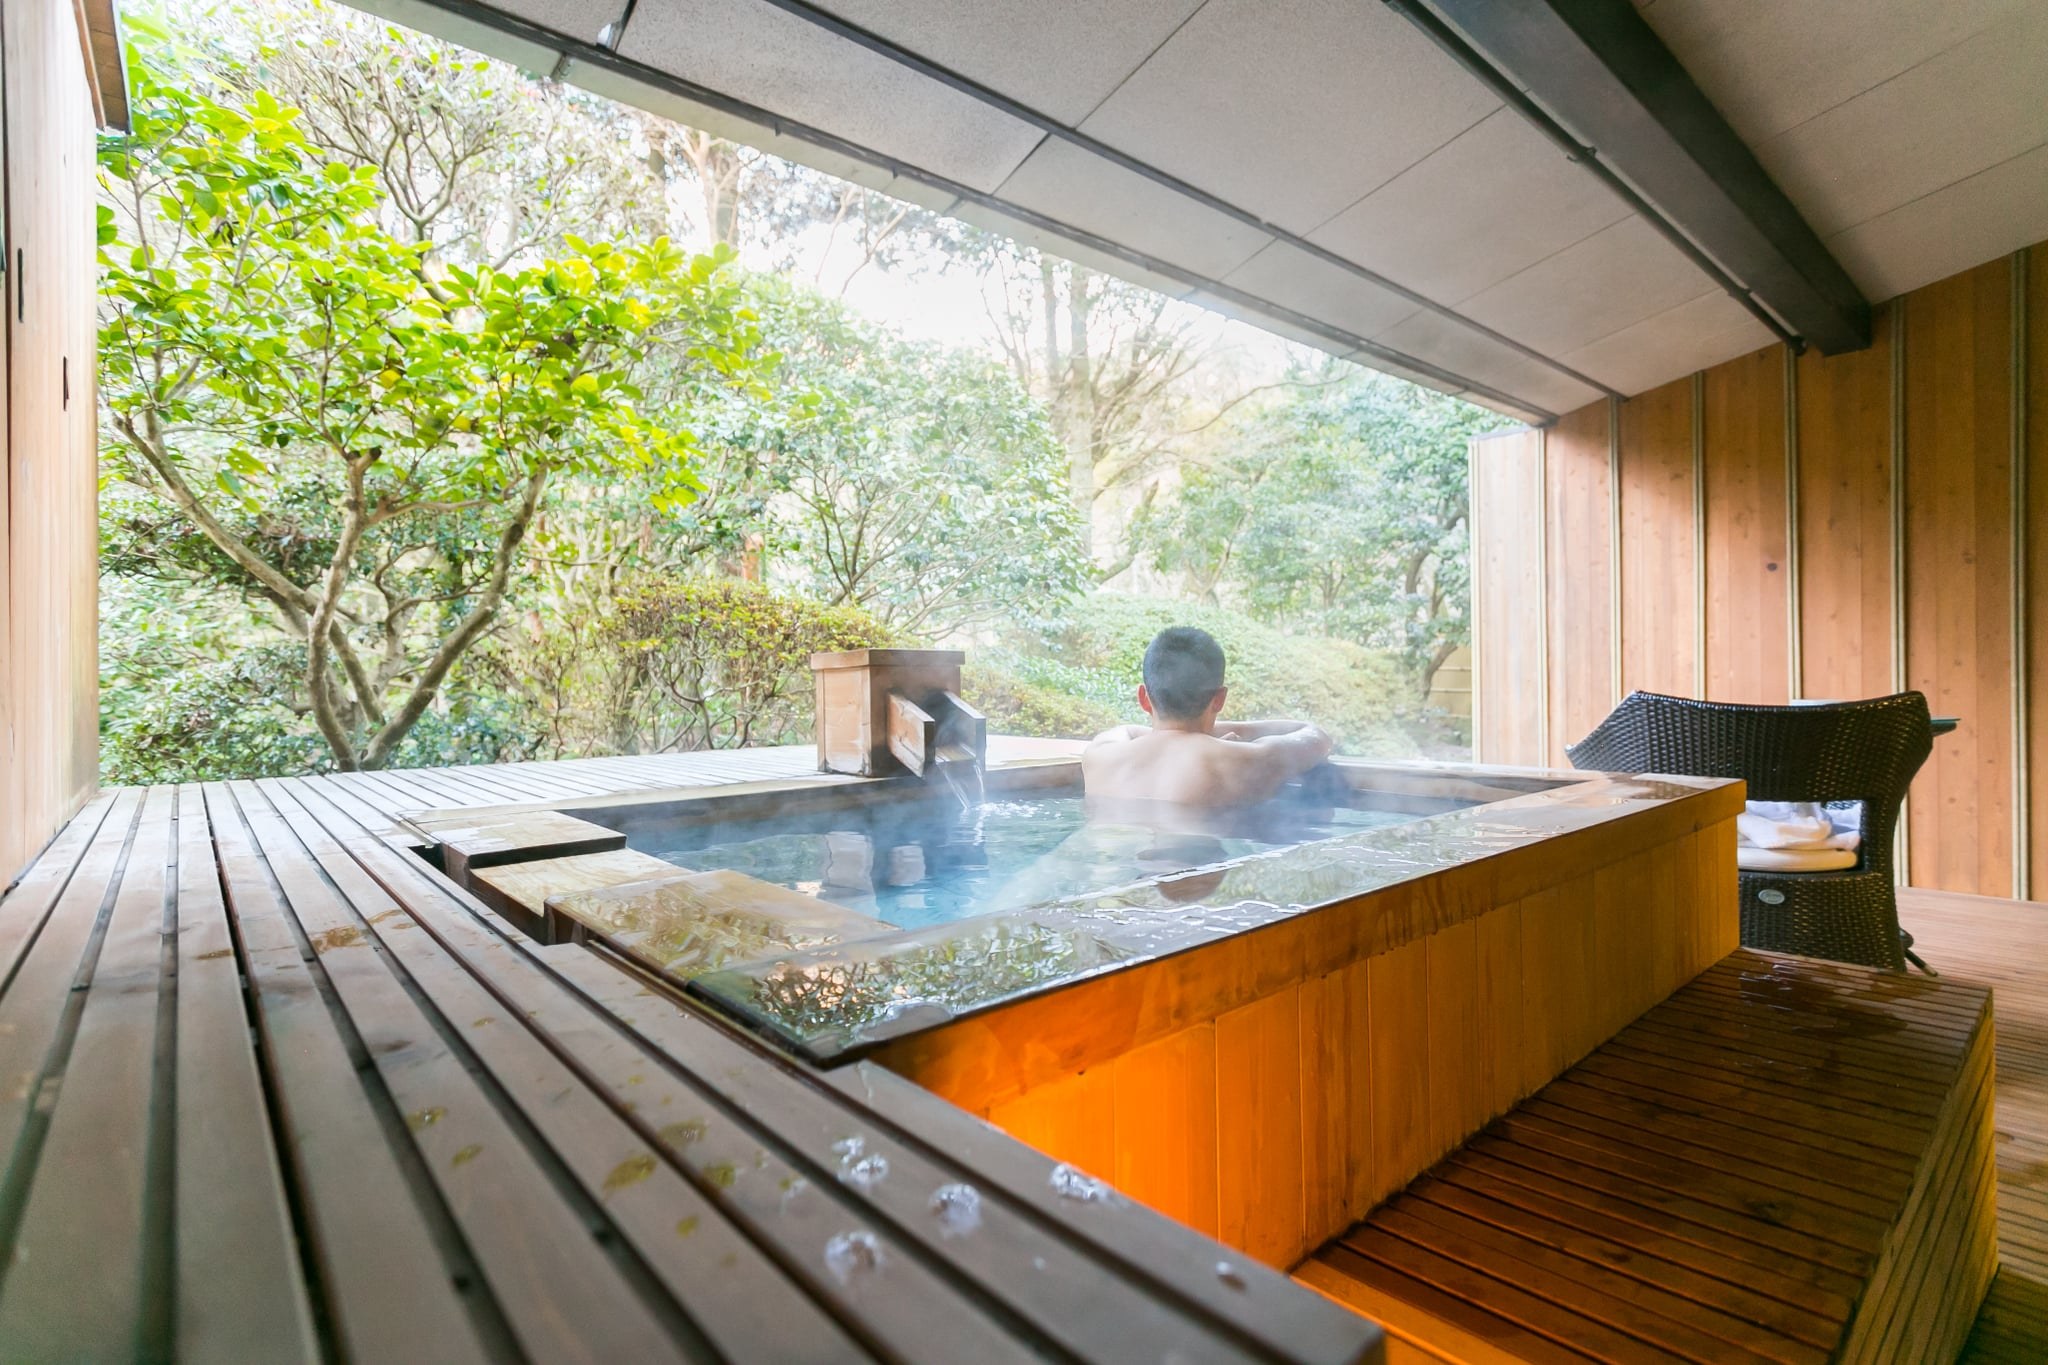 What is a japanese ryokan popsugar smart living - Ryokan tokyo with private bathroom ...